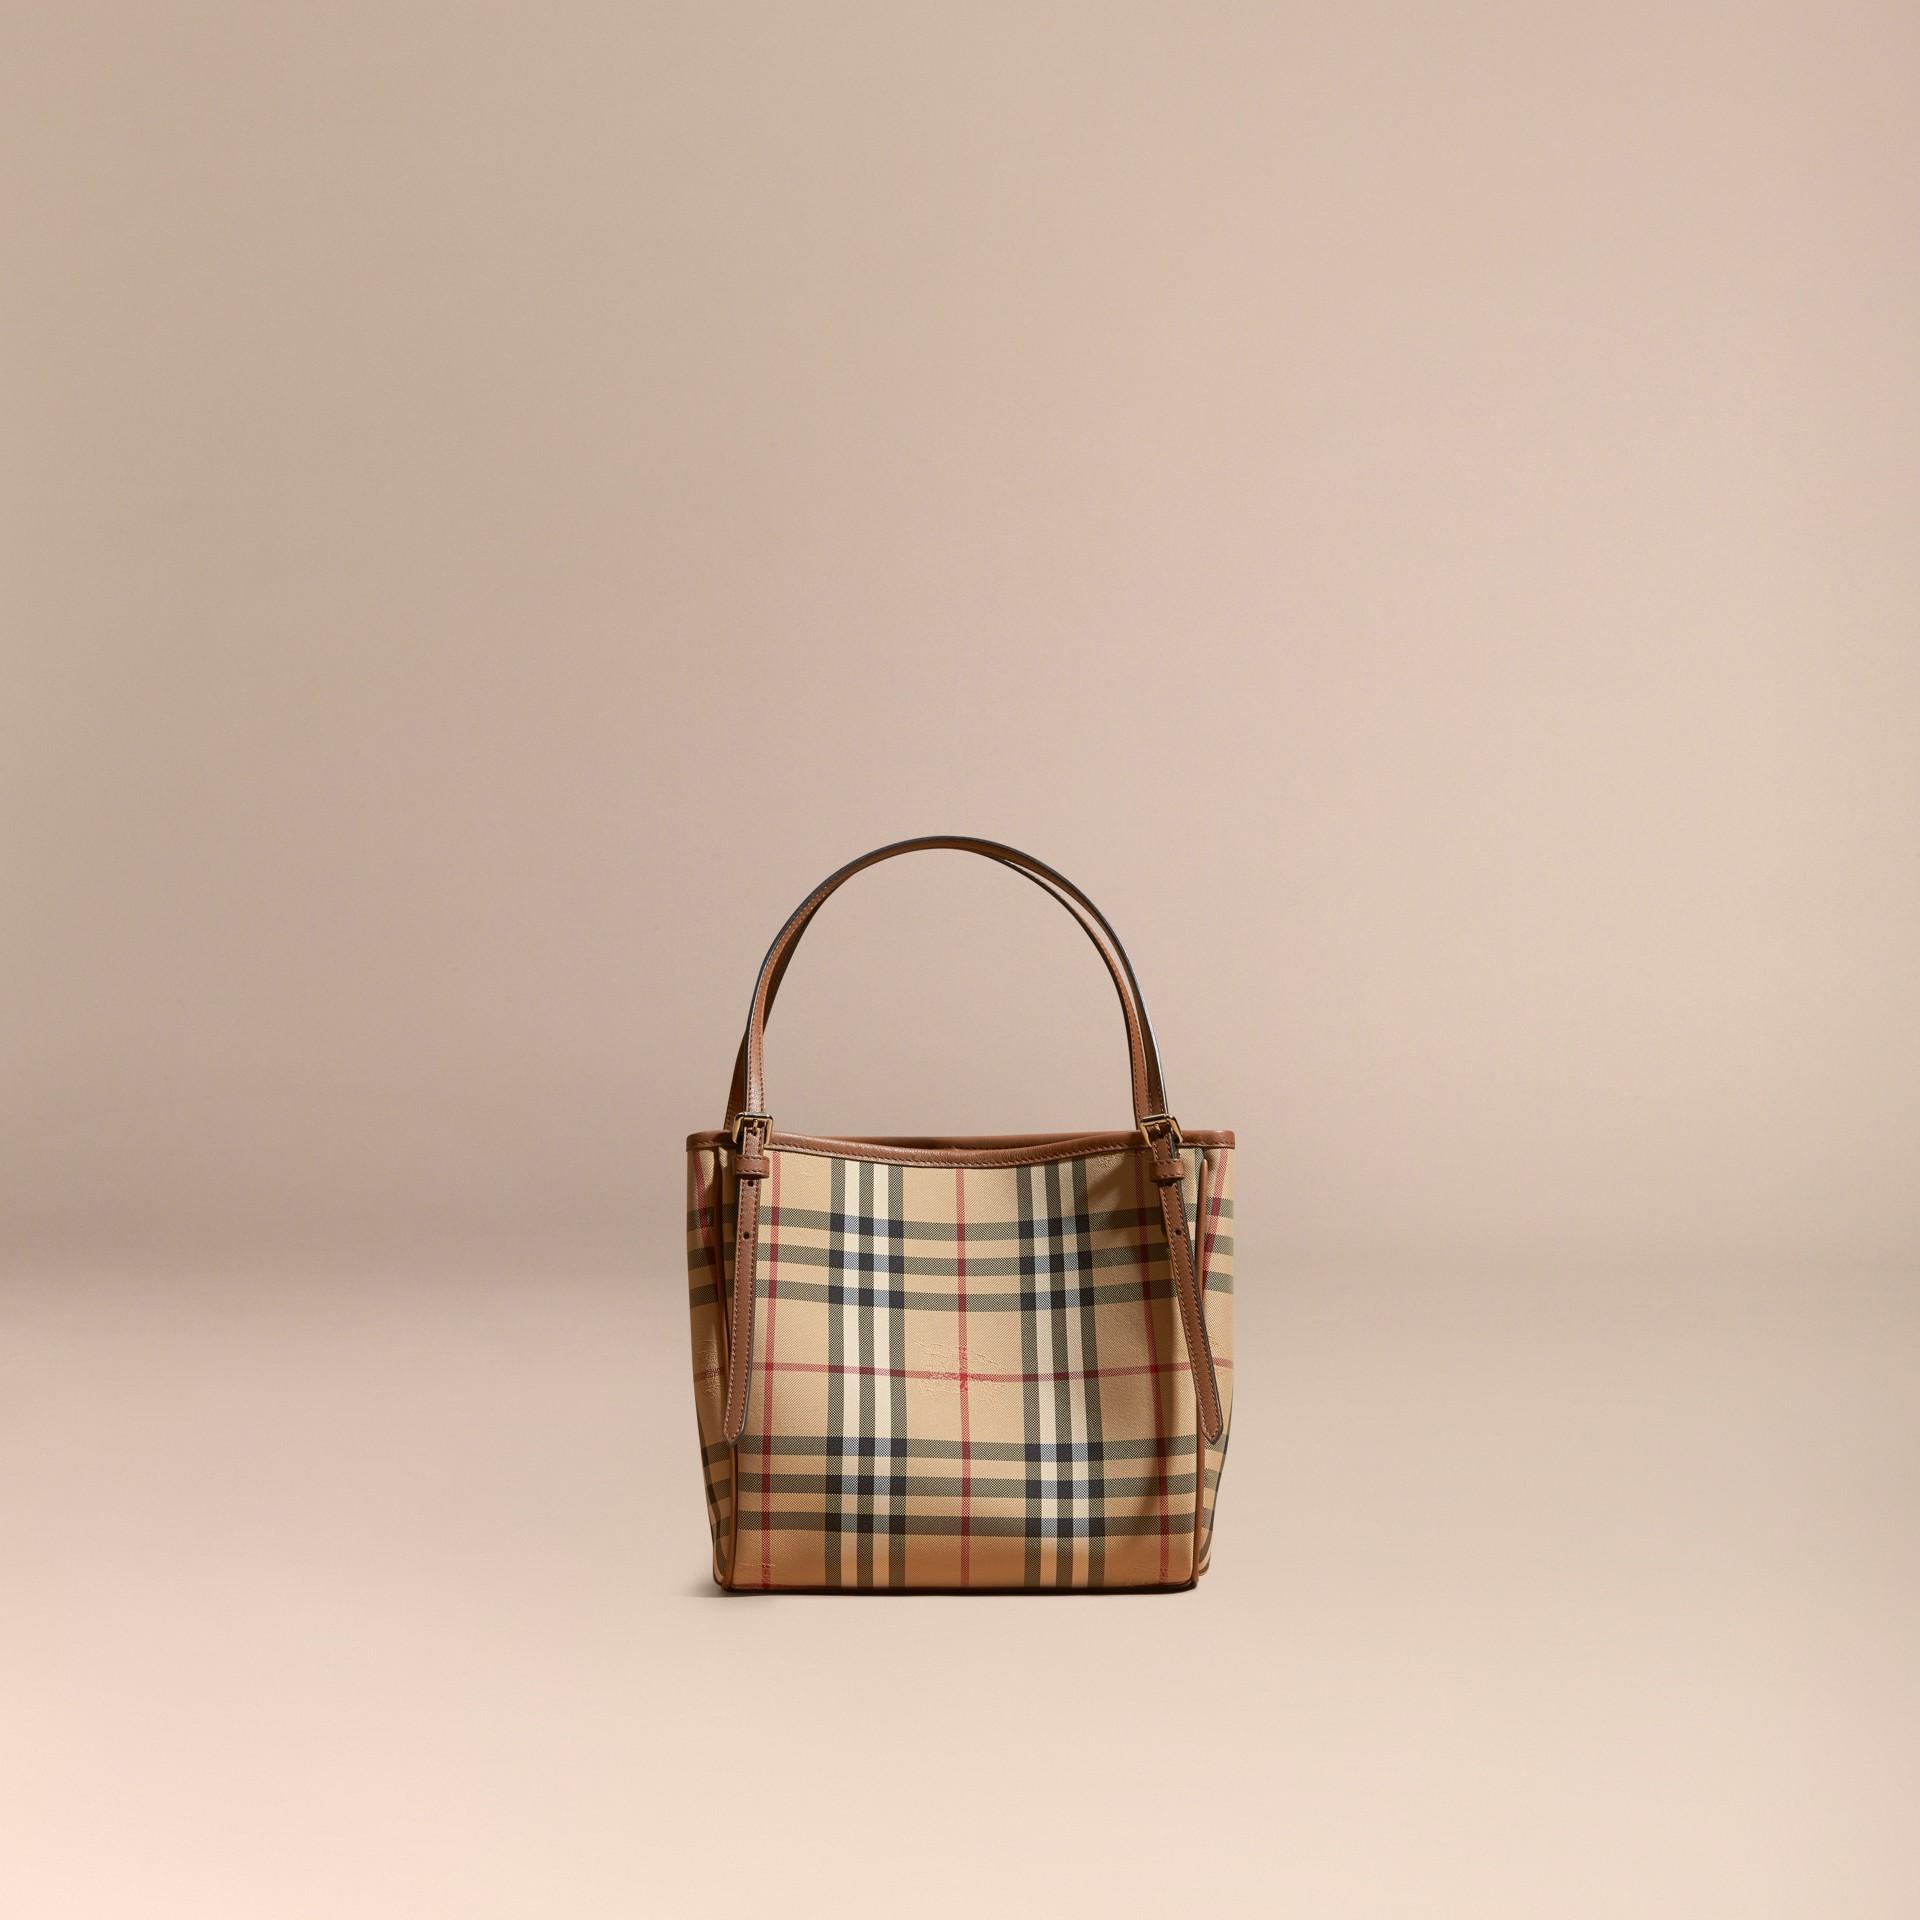 Miel/hâle Mini sac The Canter avec motif Horseferry check Miel/hâle - photo de la galerie 8